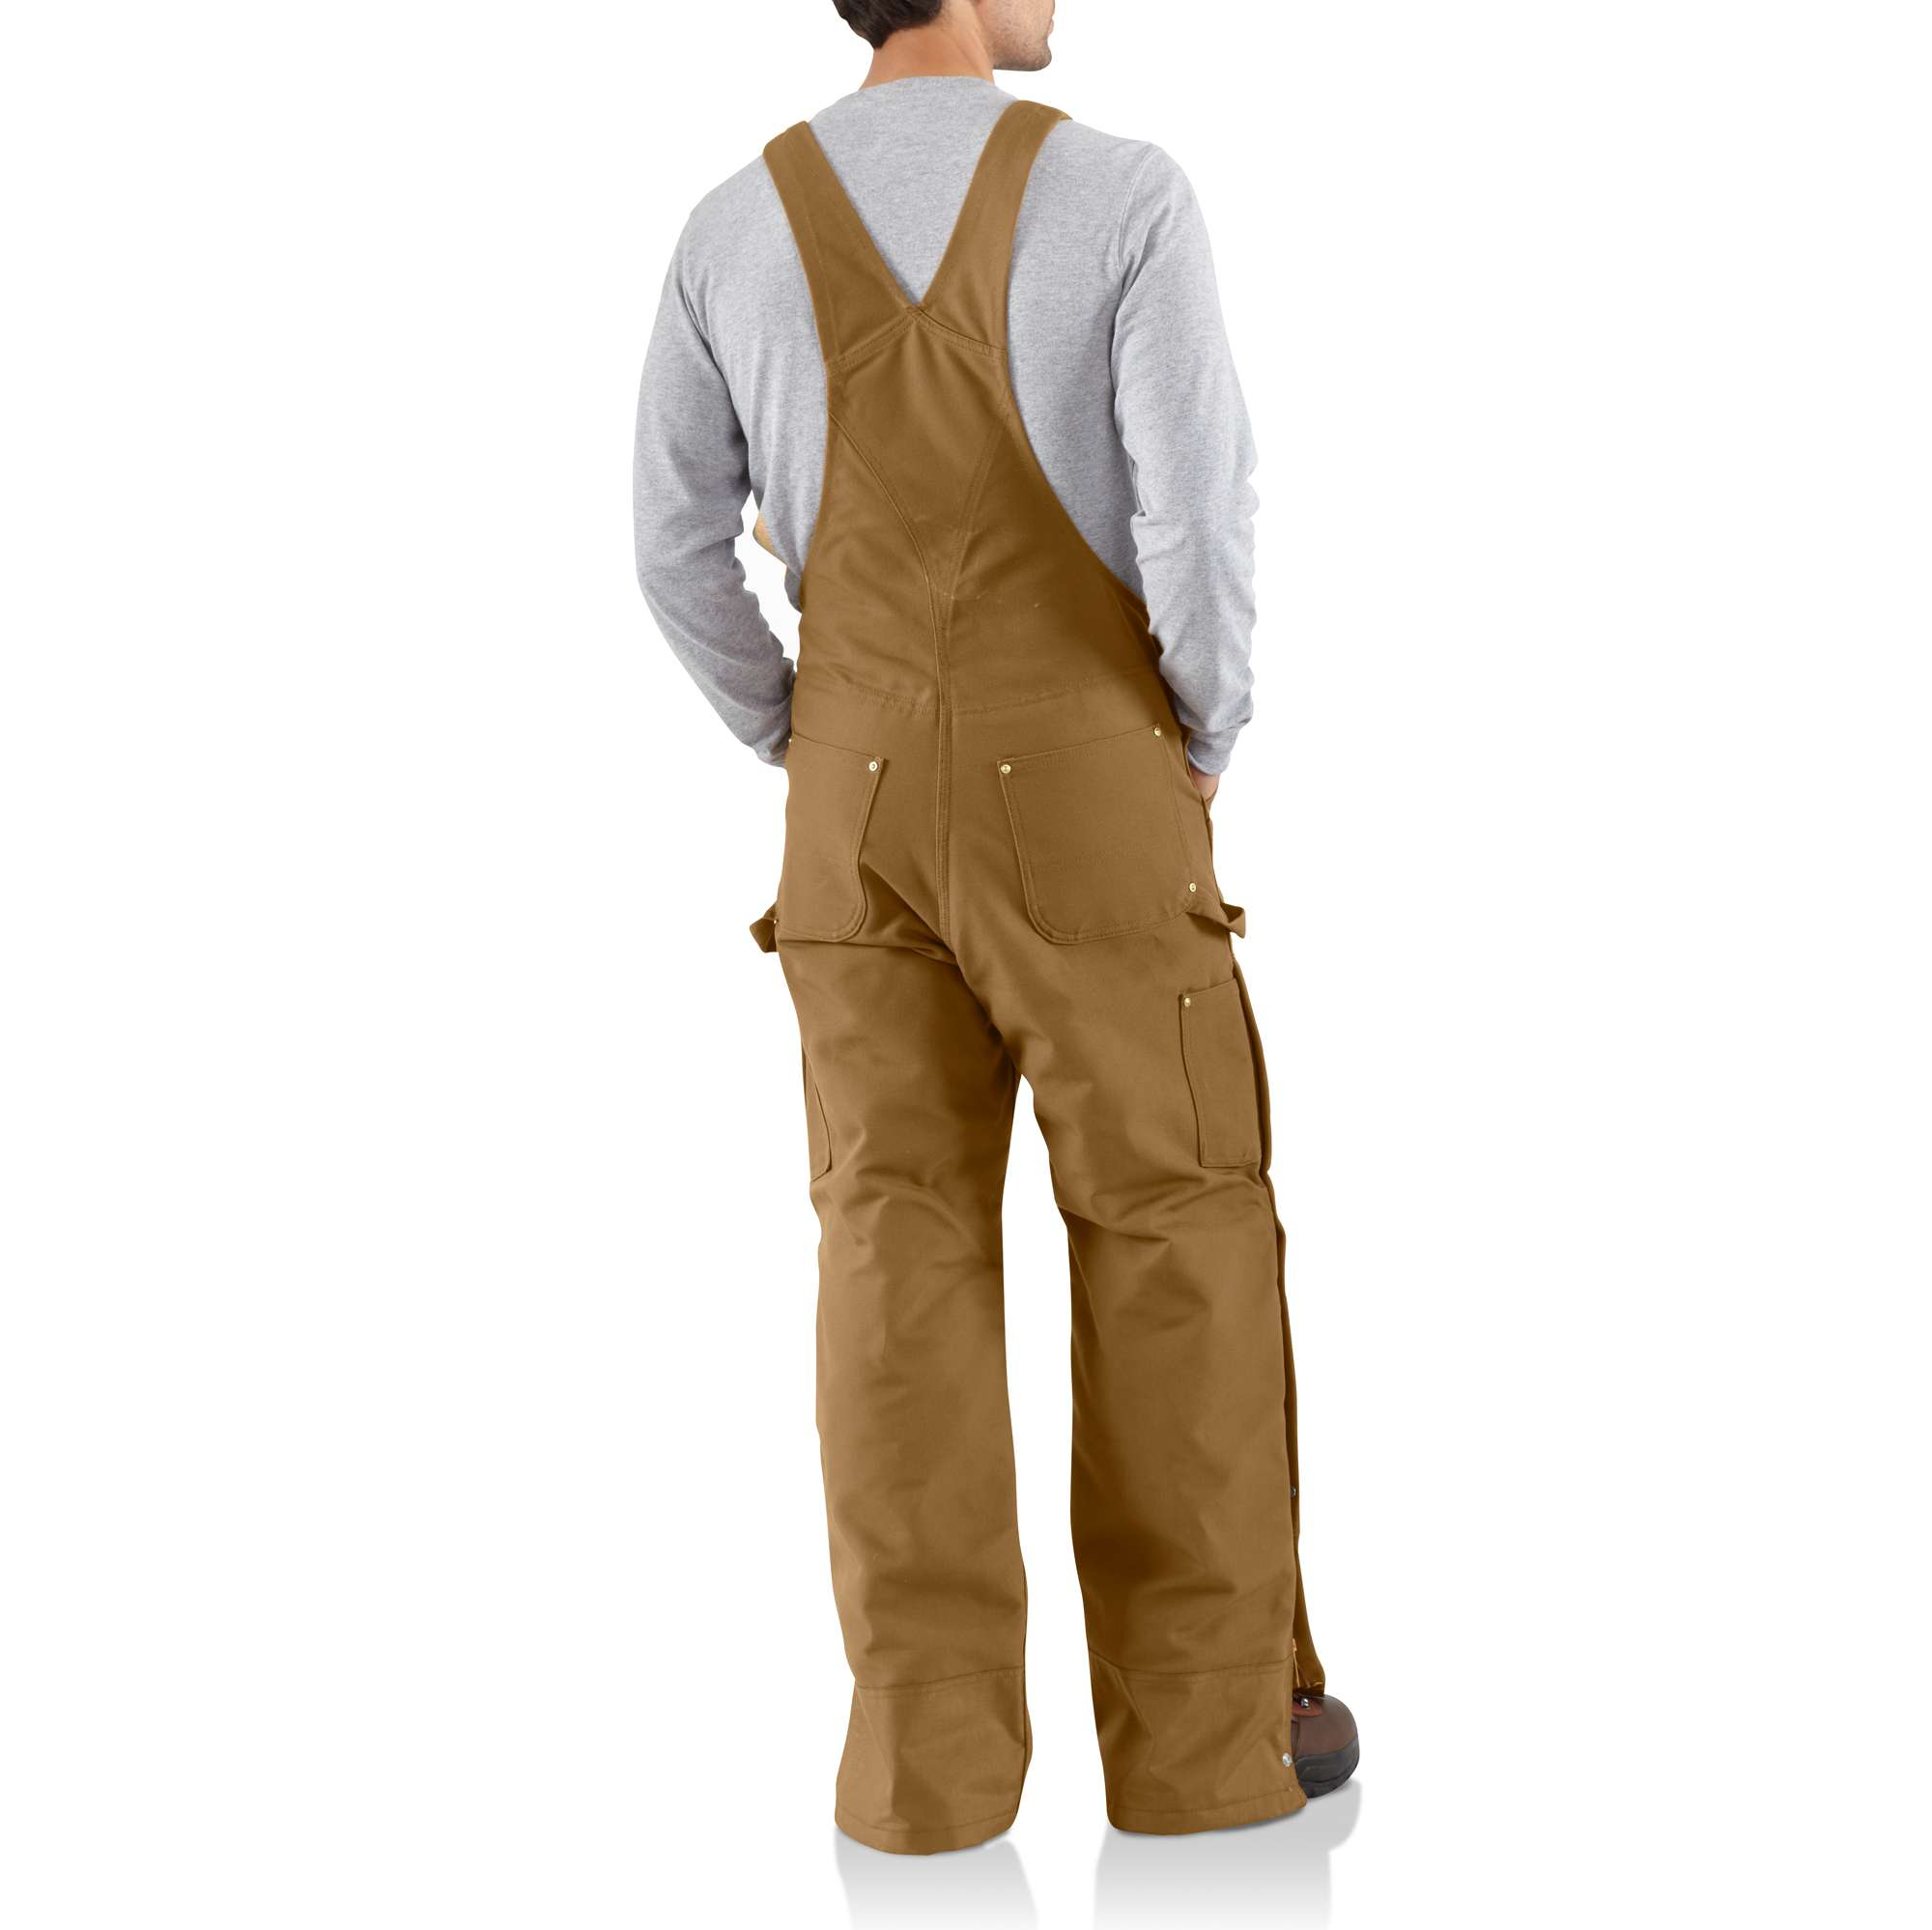 Lined Bibs & Coveralls | Carhartt : carhartt quilt lined duck bib overalls - Adamdwight.com